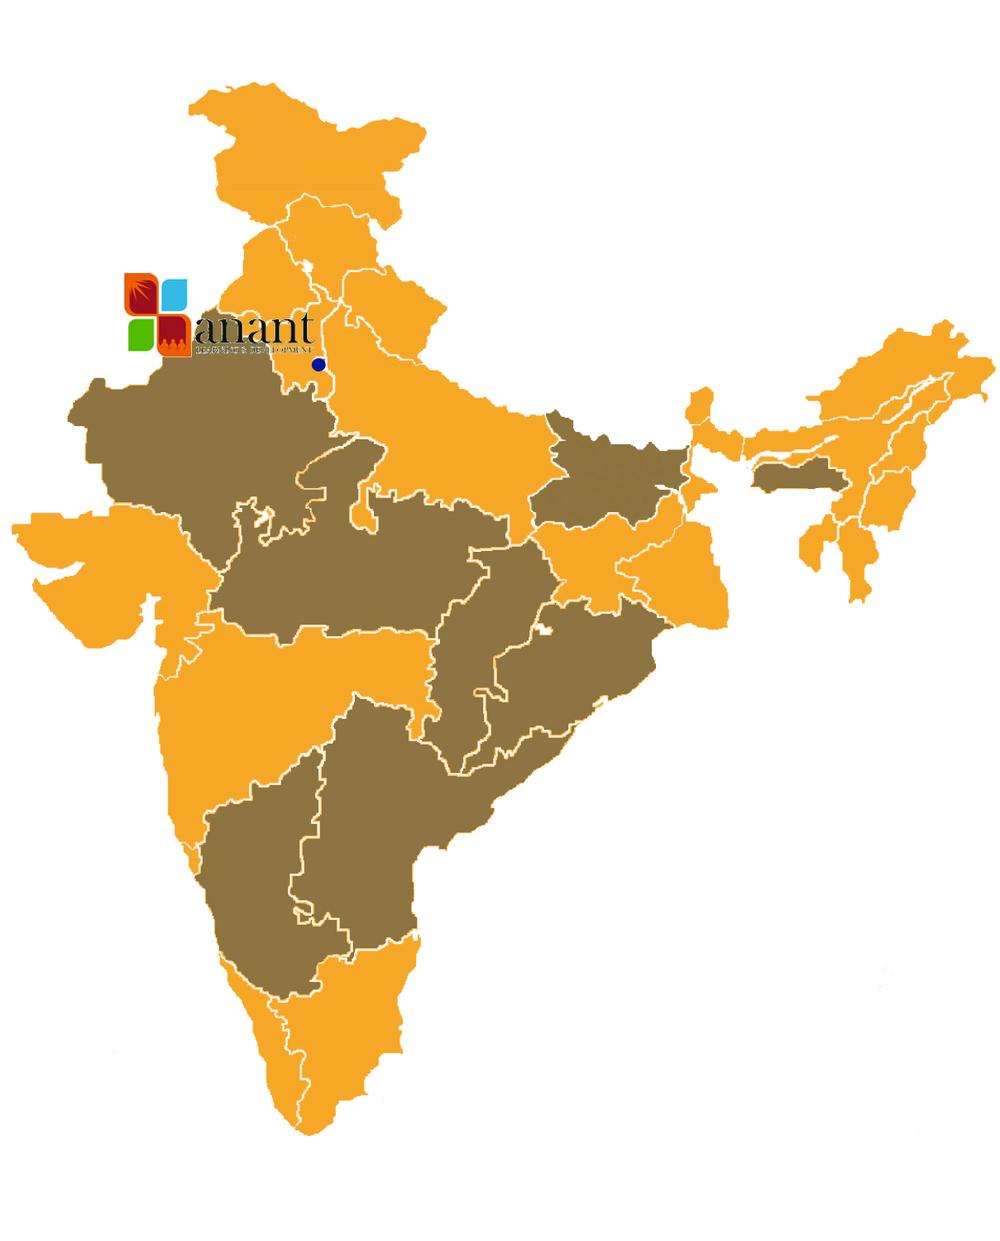 Anant-logo-map.jpg